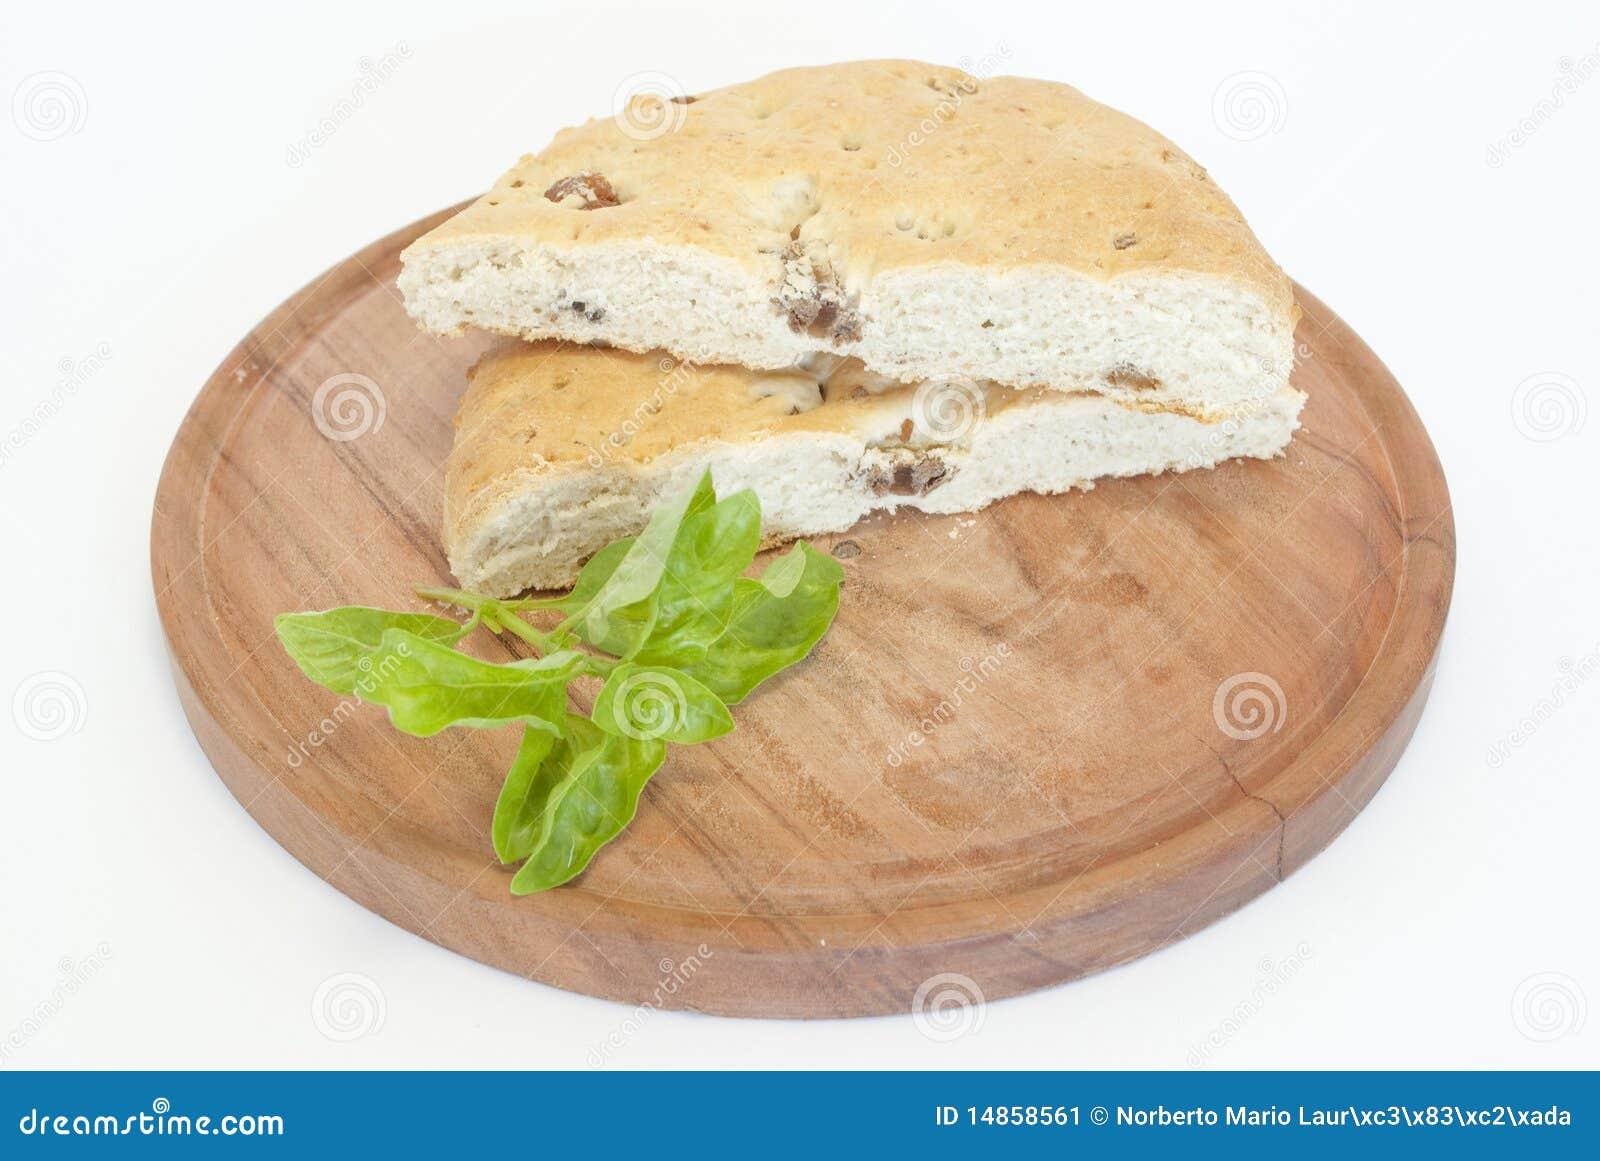 Bread with pork skin